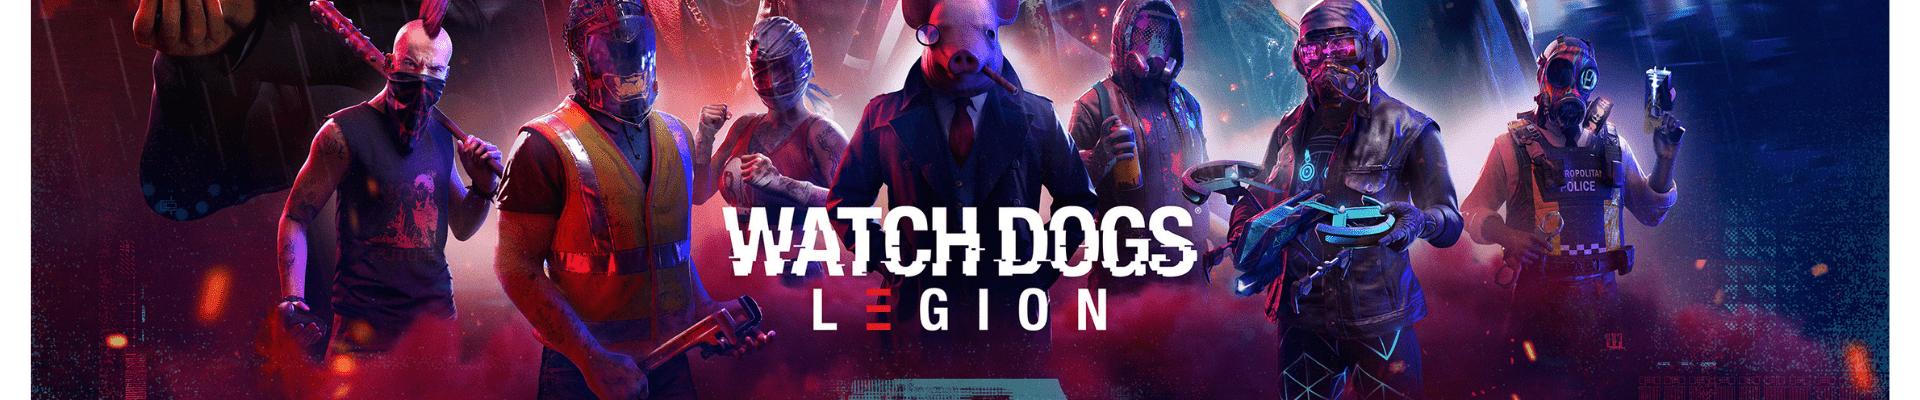 WATCH DOGS LEGION Ultimate Edition [Активация Игры Uplay – Оффлайн Режим]